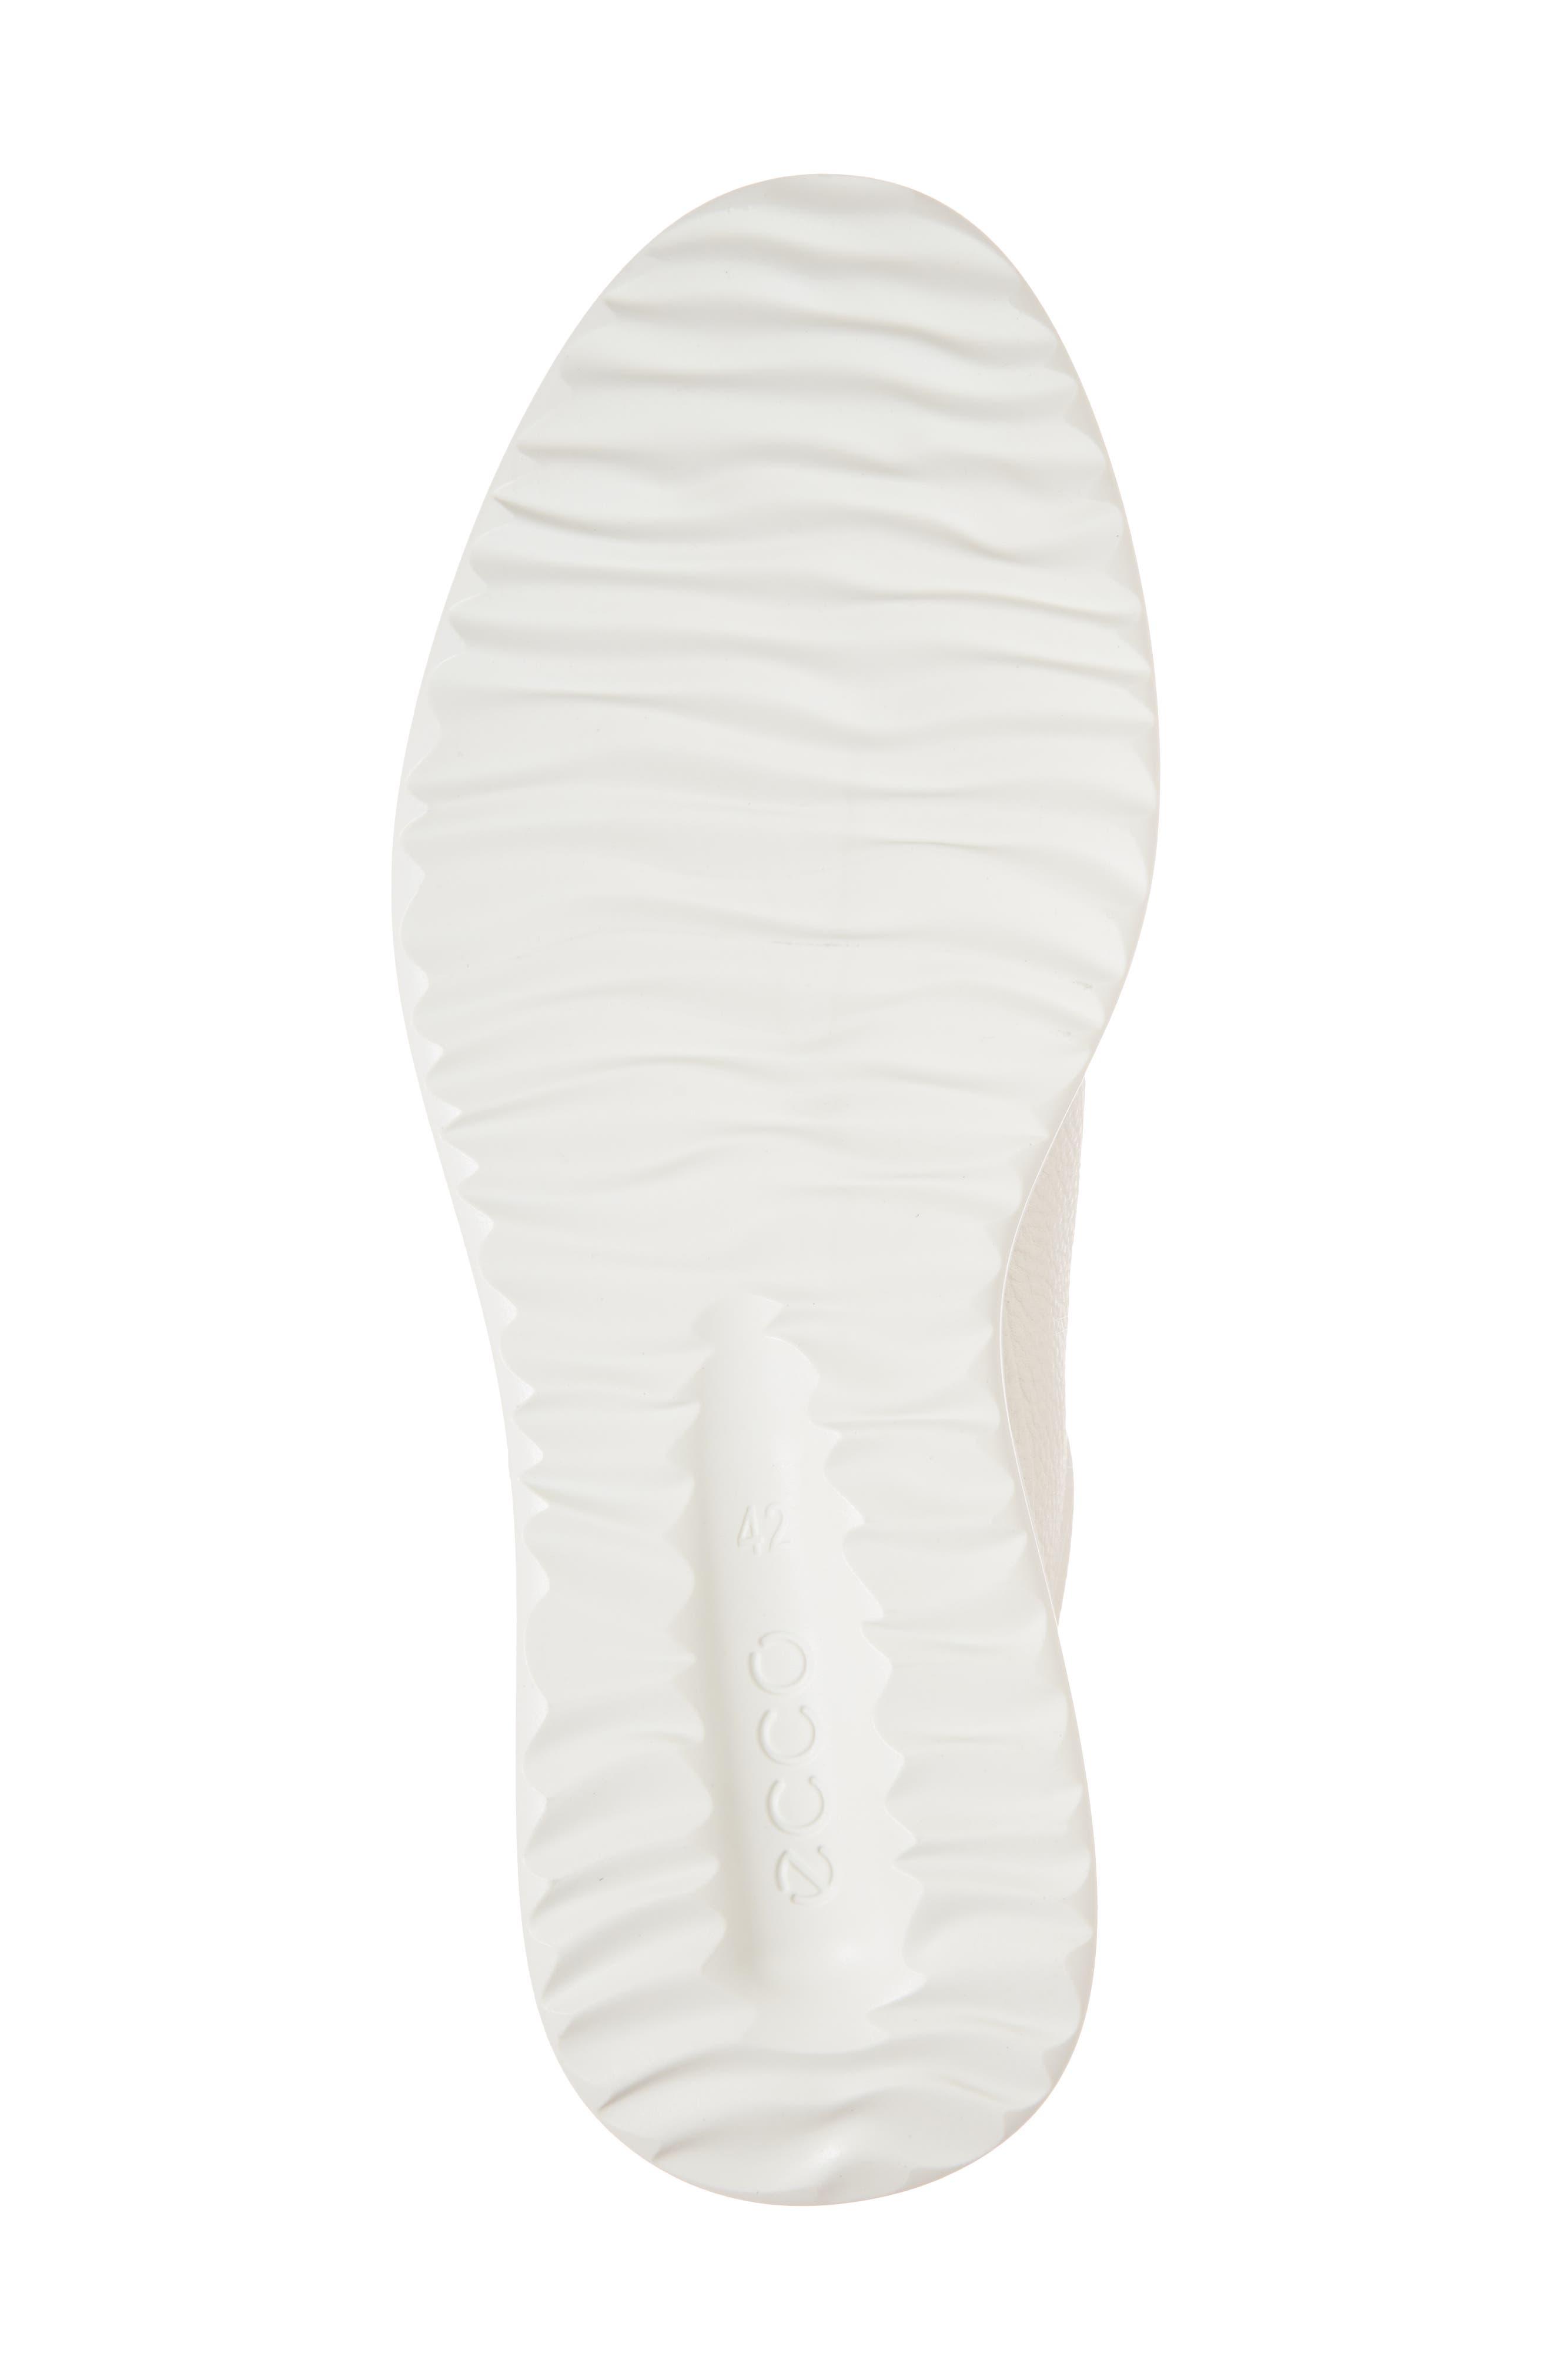 Aquet Low Top Sneaker,                             Alternate thumbnail 6, color,                             White Leather